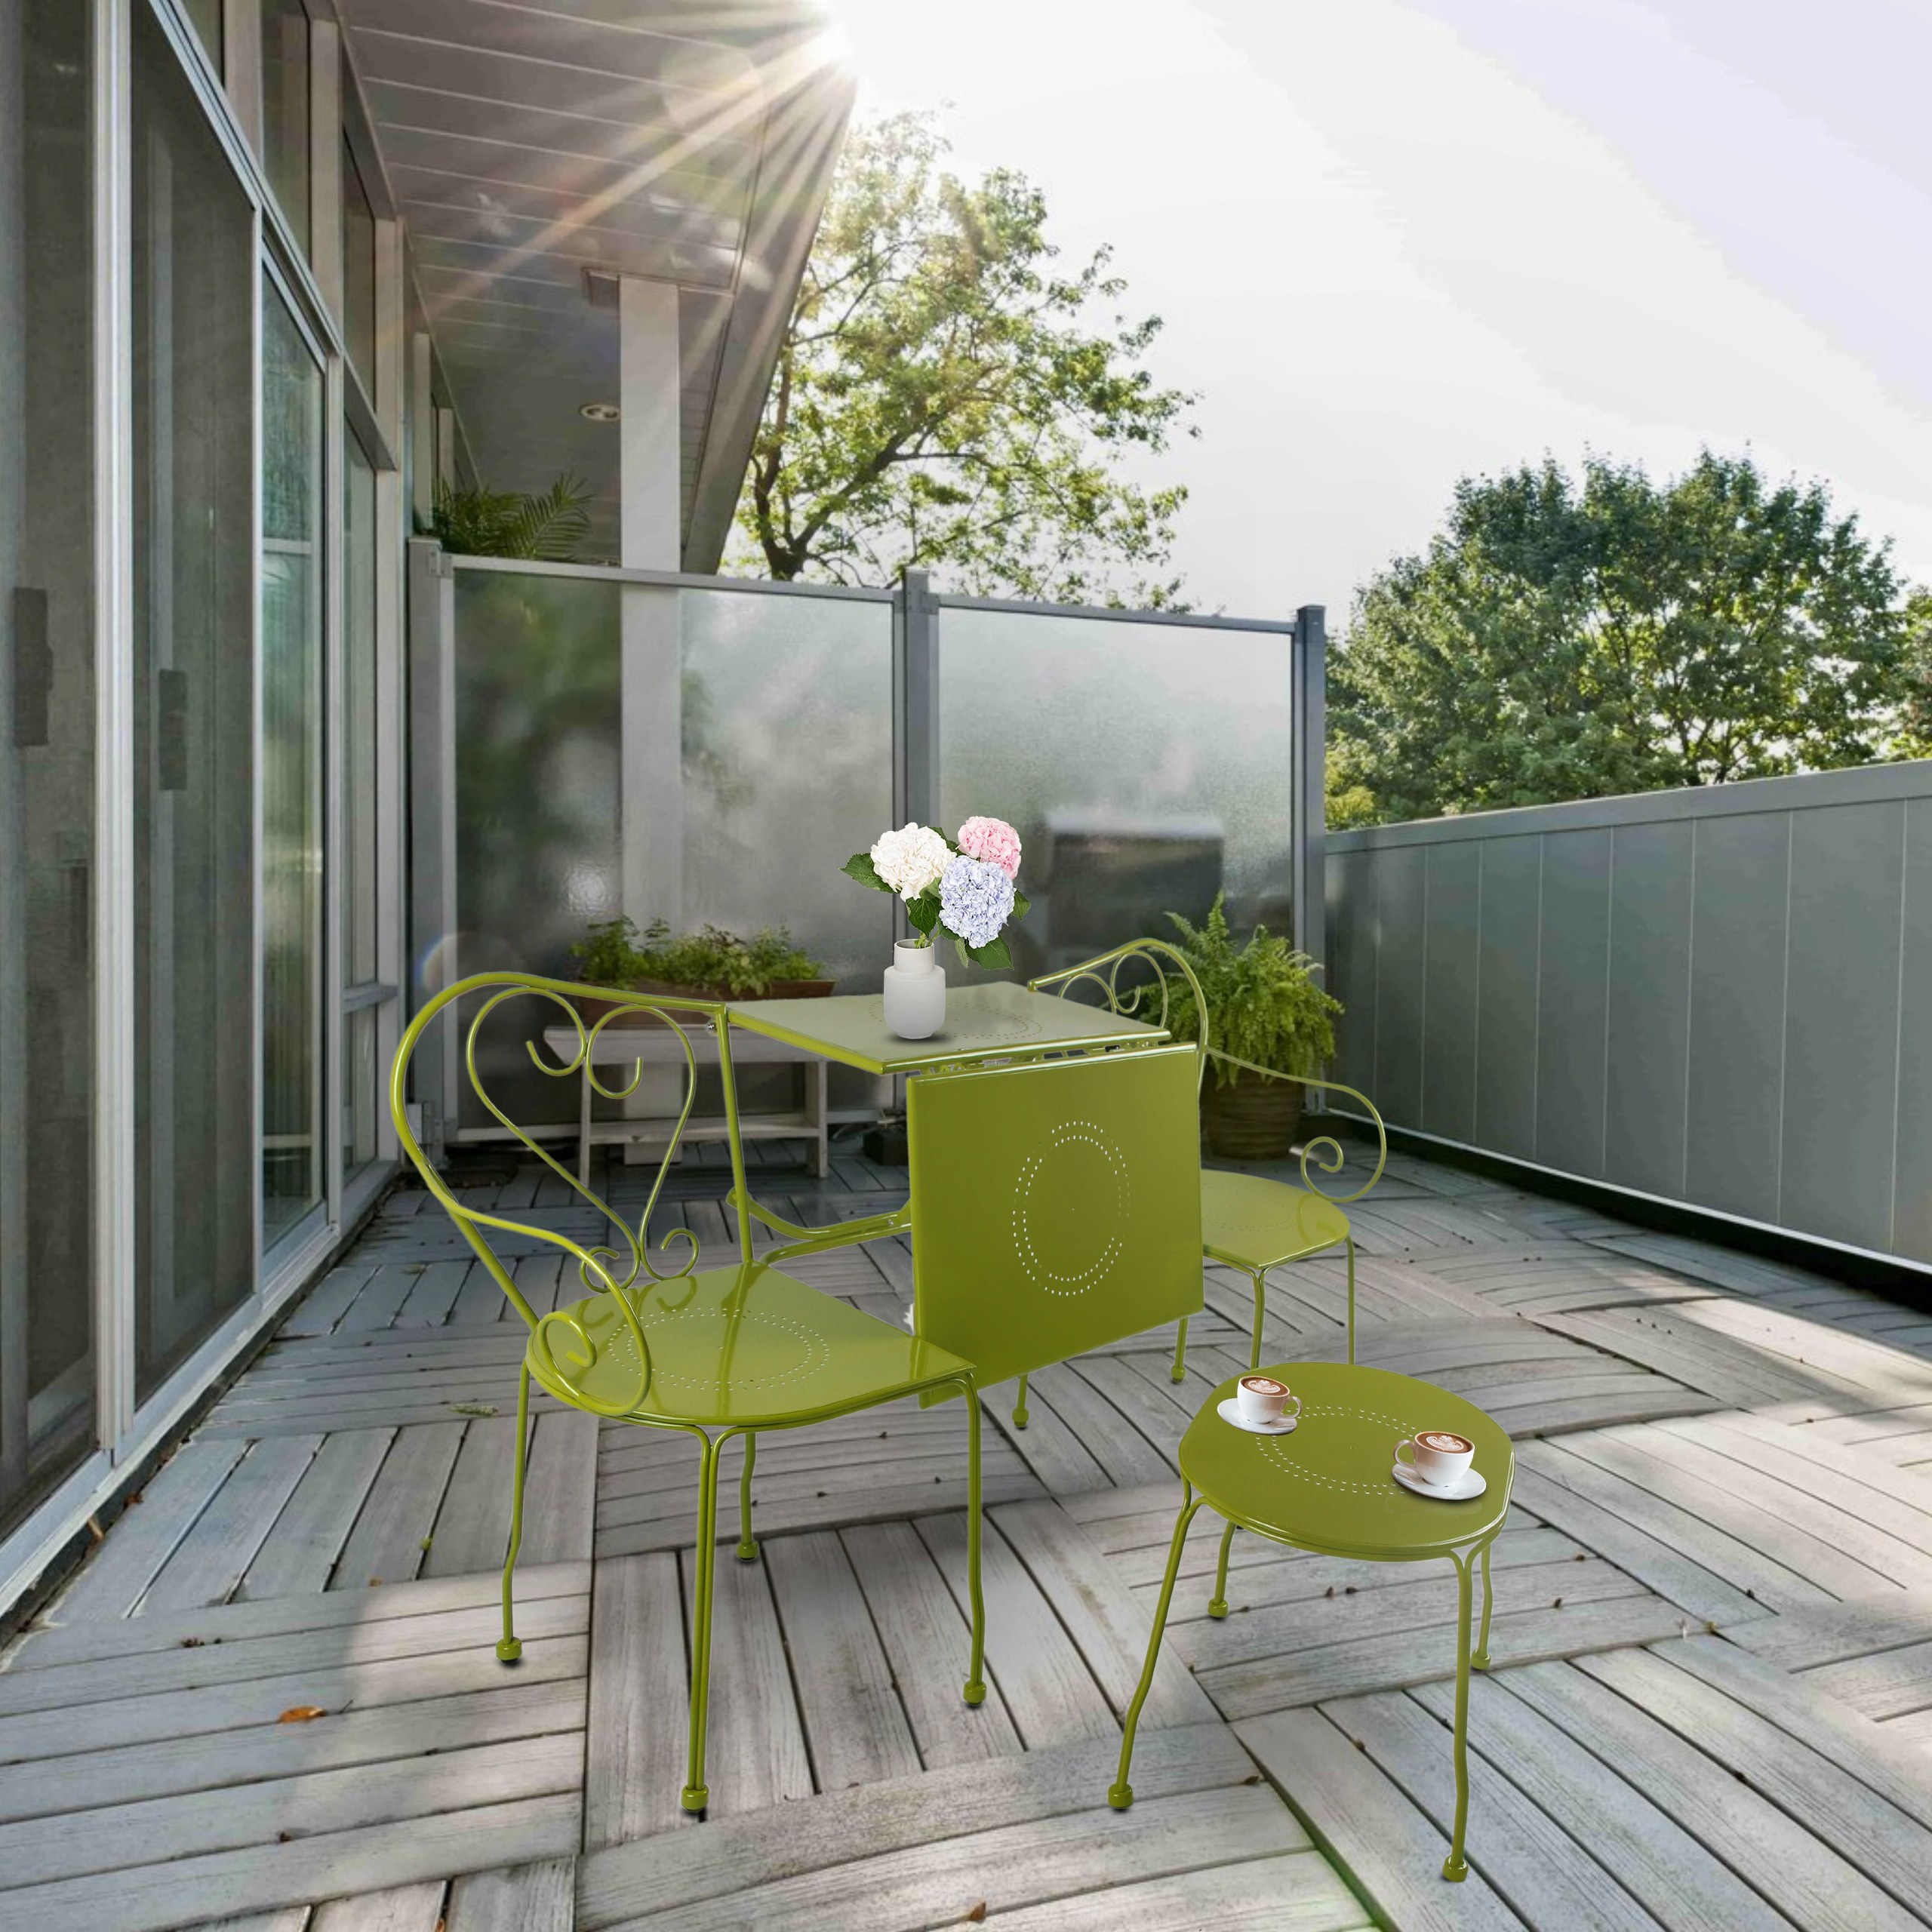 Záhradný balkónový nábytkový set Stolný konferenčný stolík Kód produktu H095719A